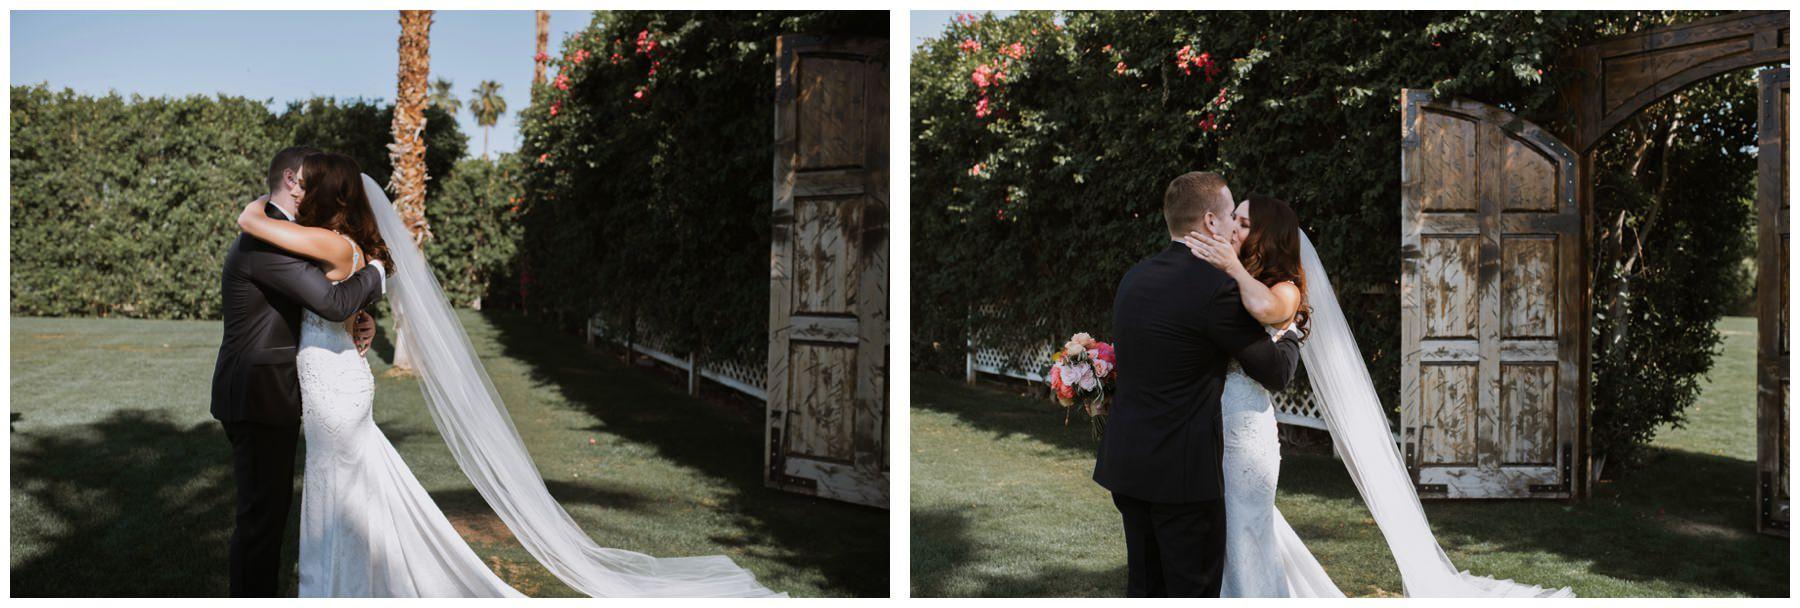 Parker_Palm_Springs_Wedding_0026.jpg